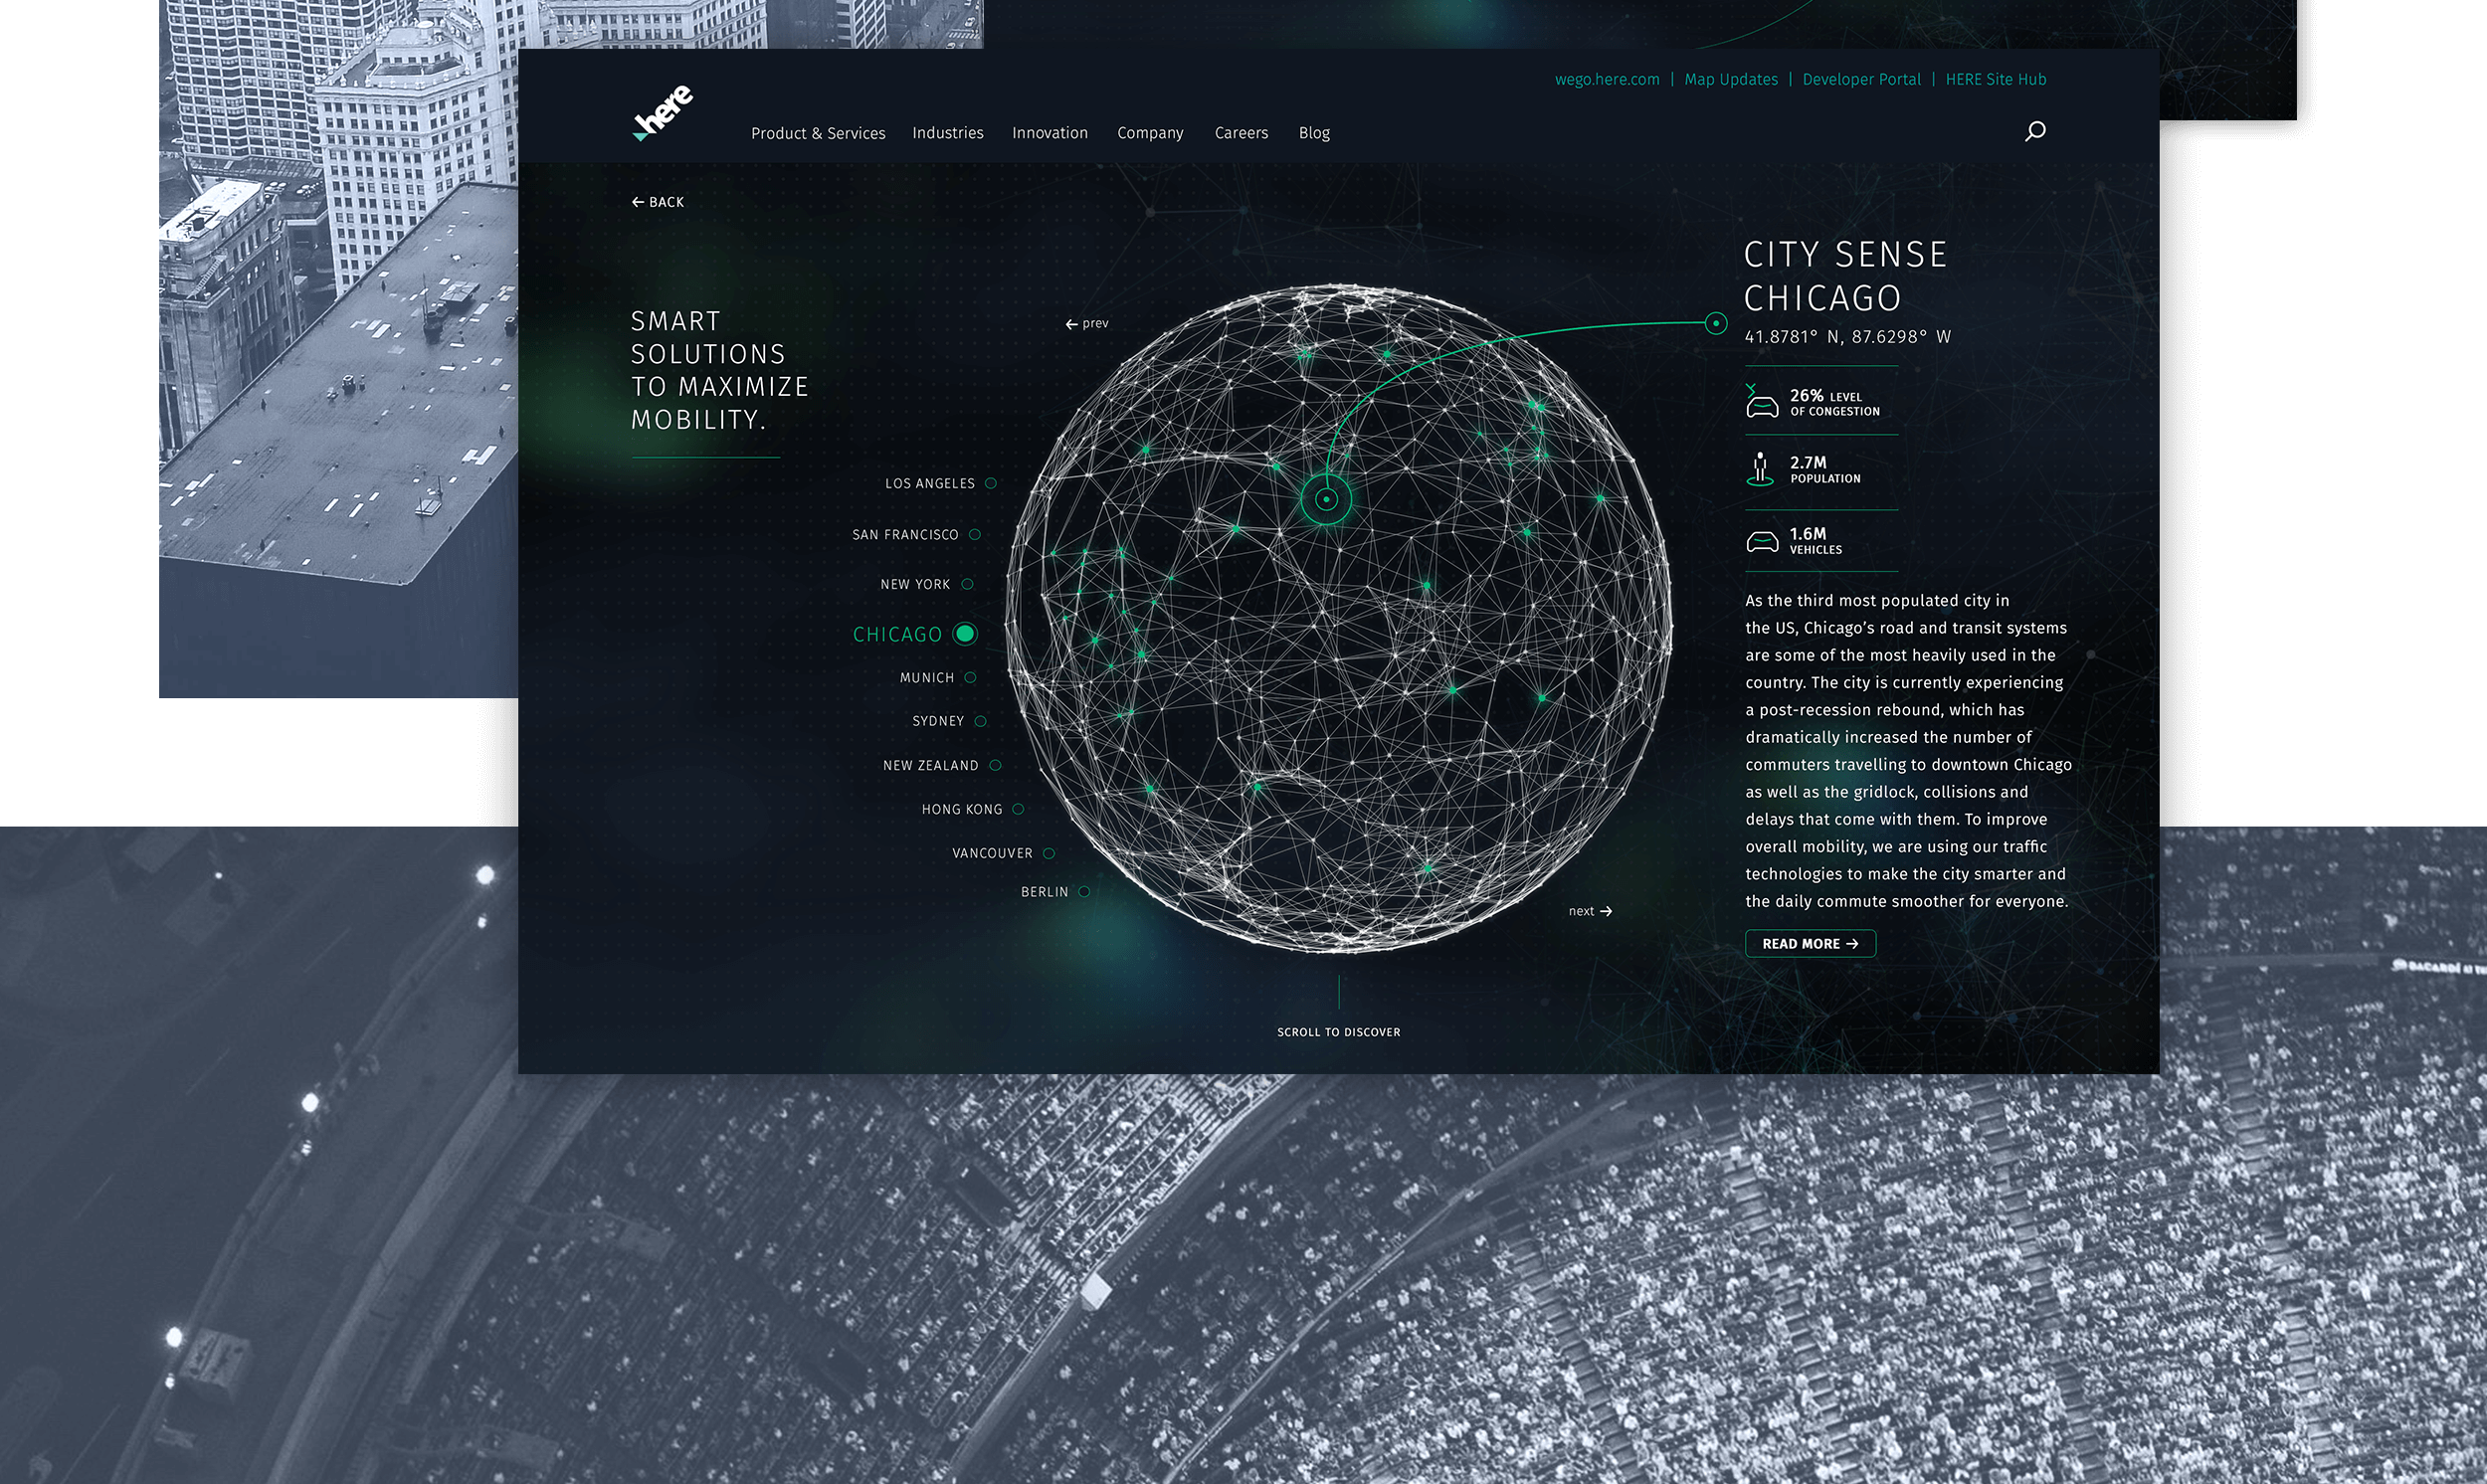 009-HERE-SmartCities-IMG01-04